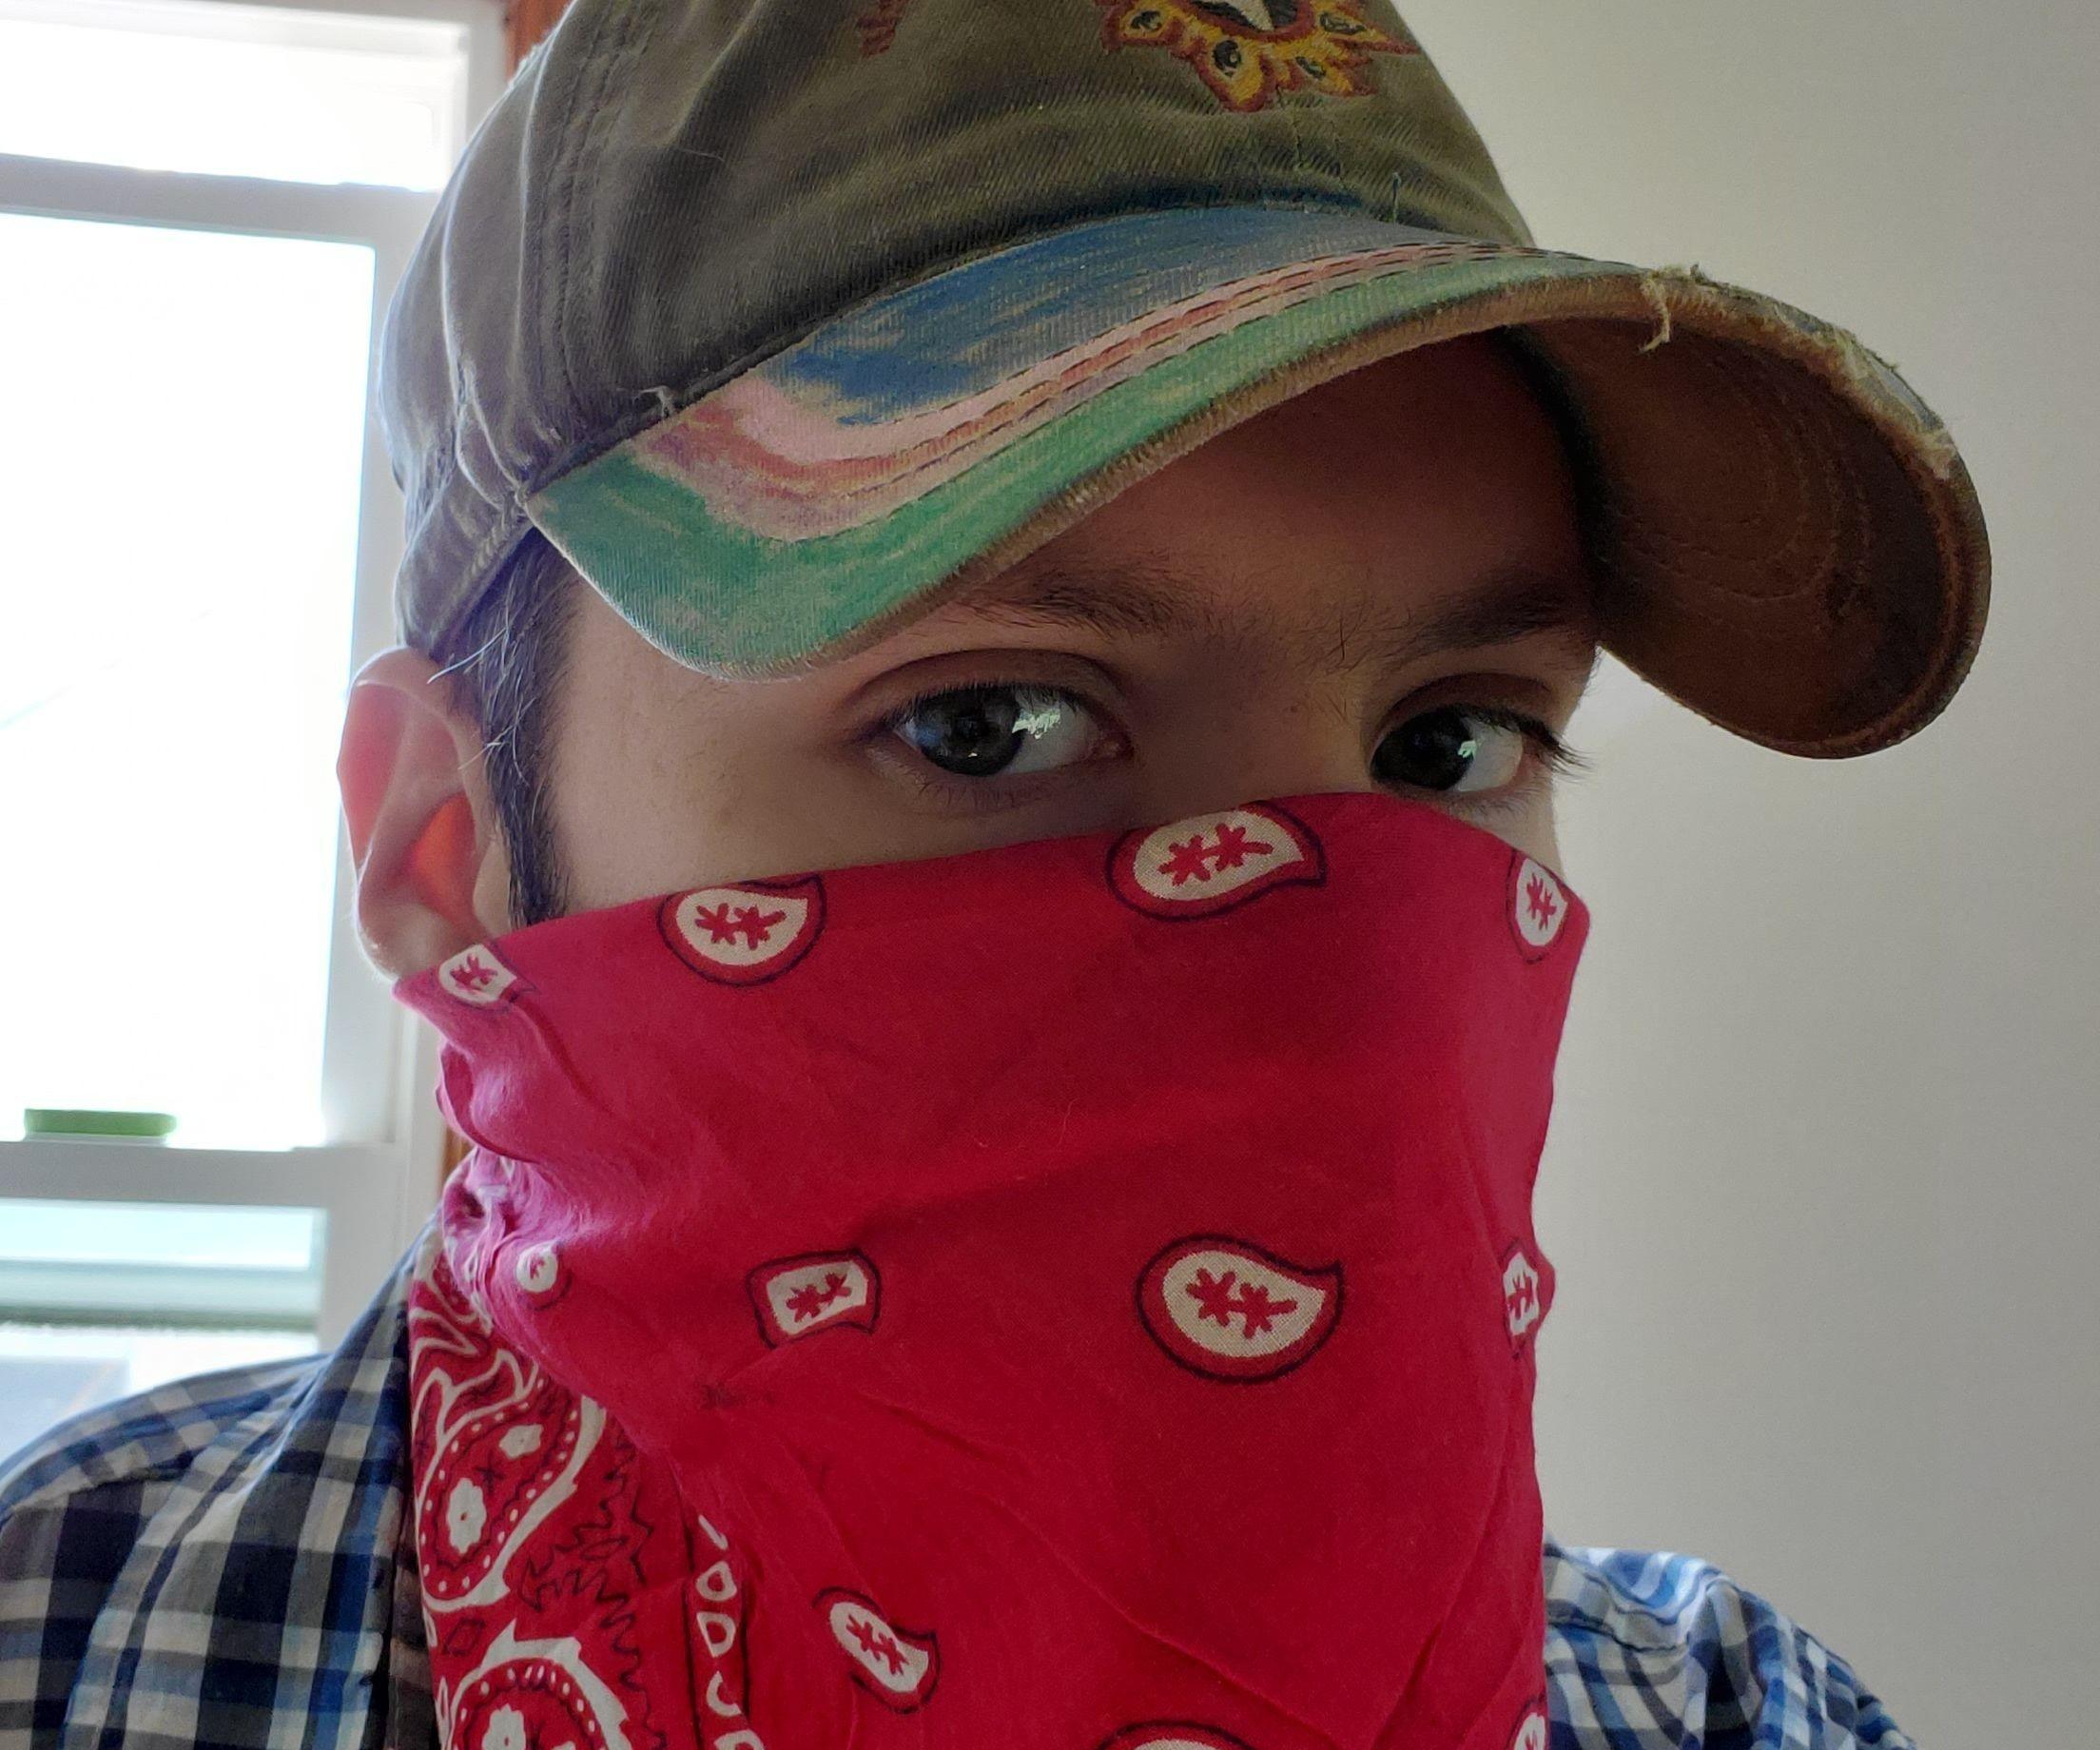 Backup Mask for One Handed Use